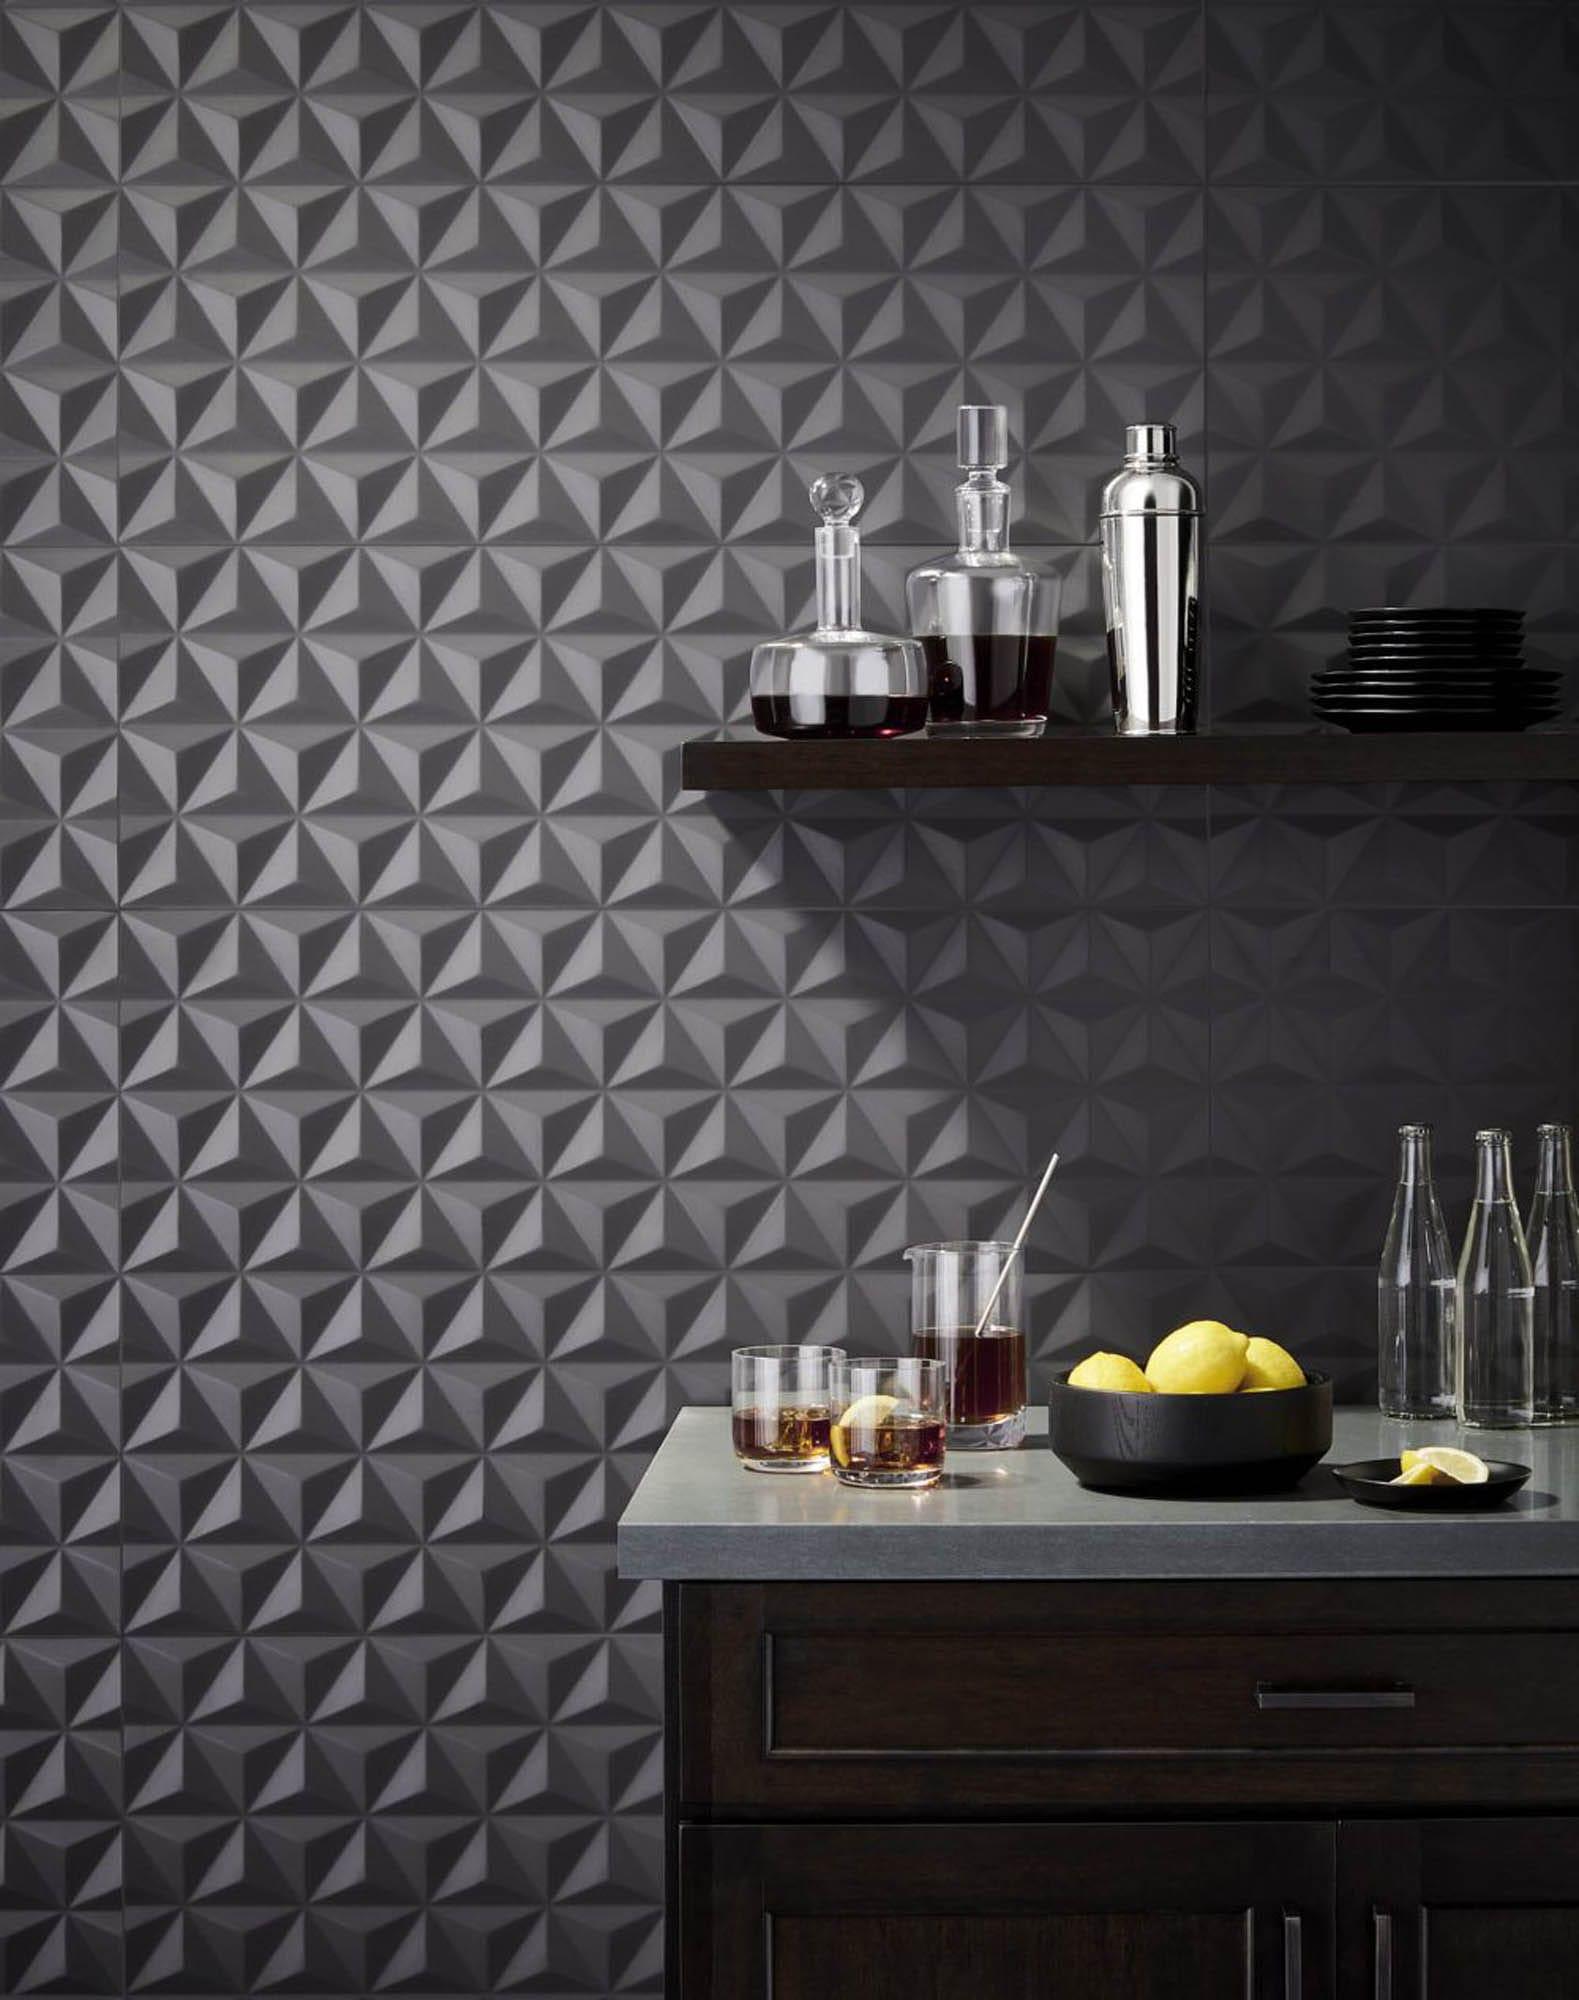 Black geometric bar wall tile